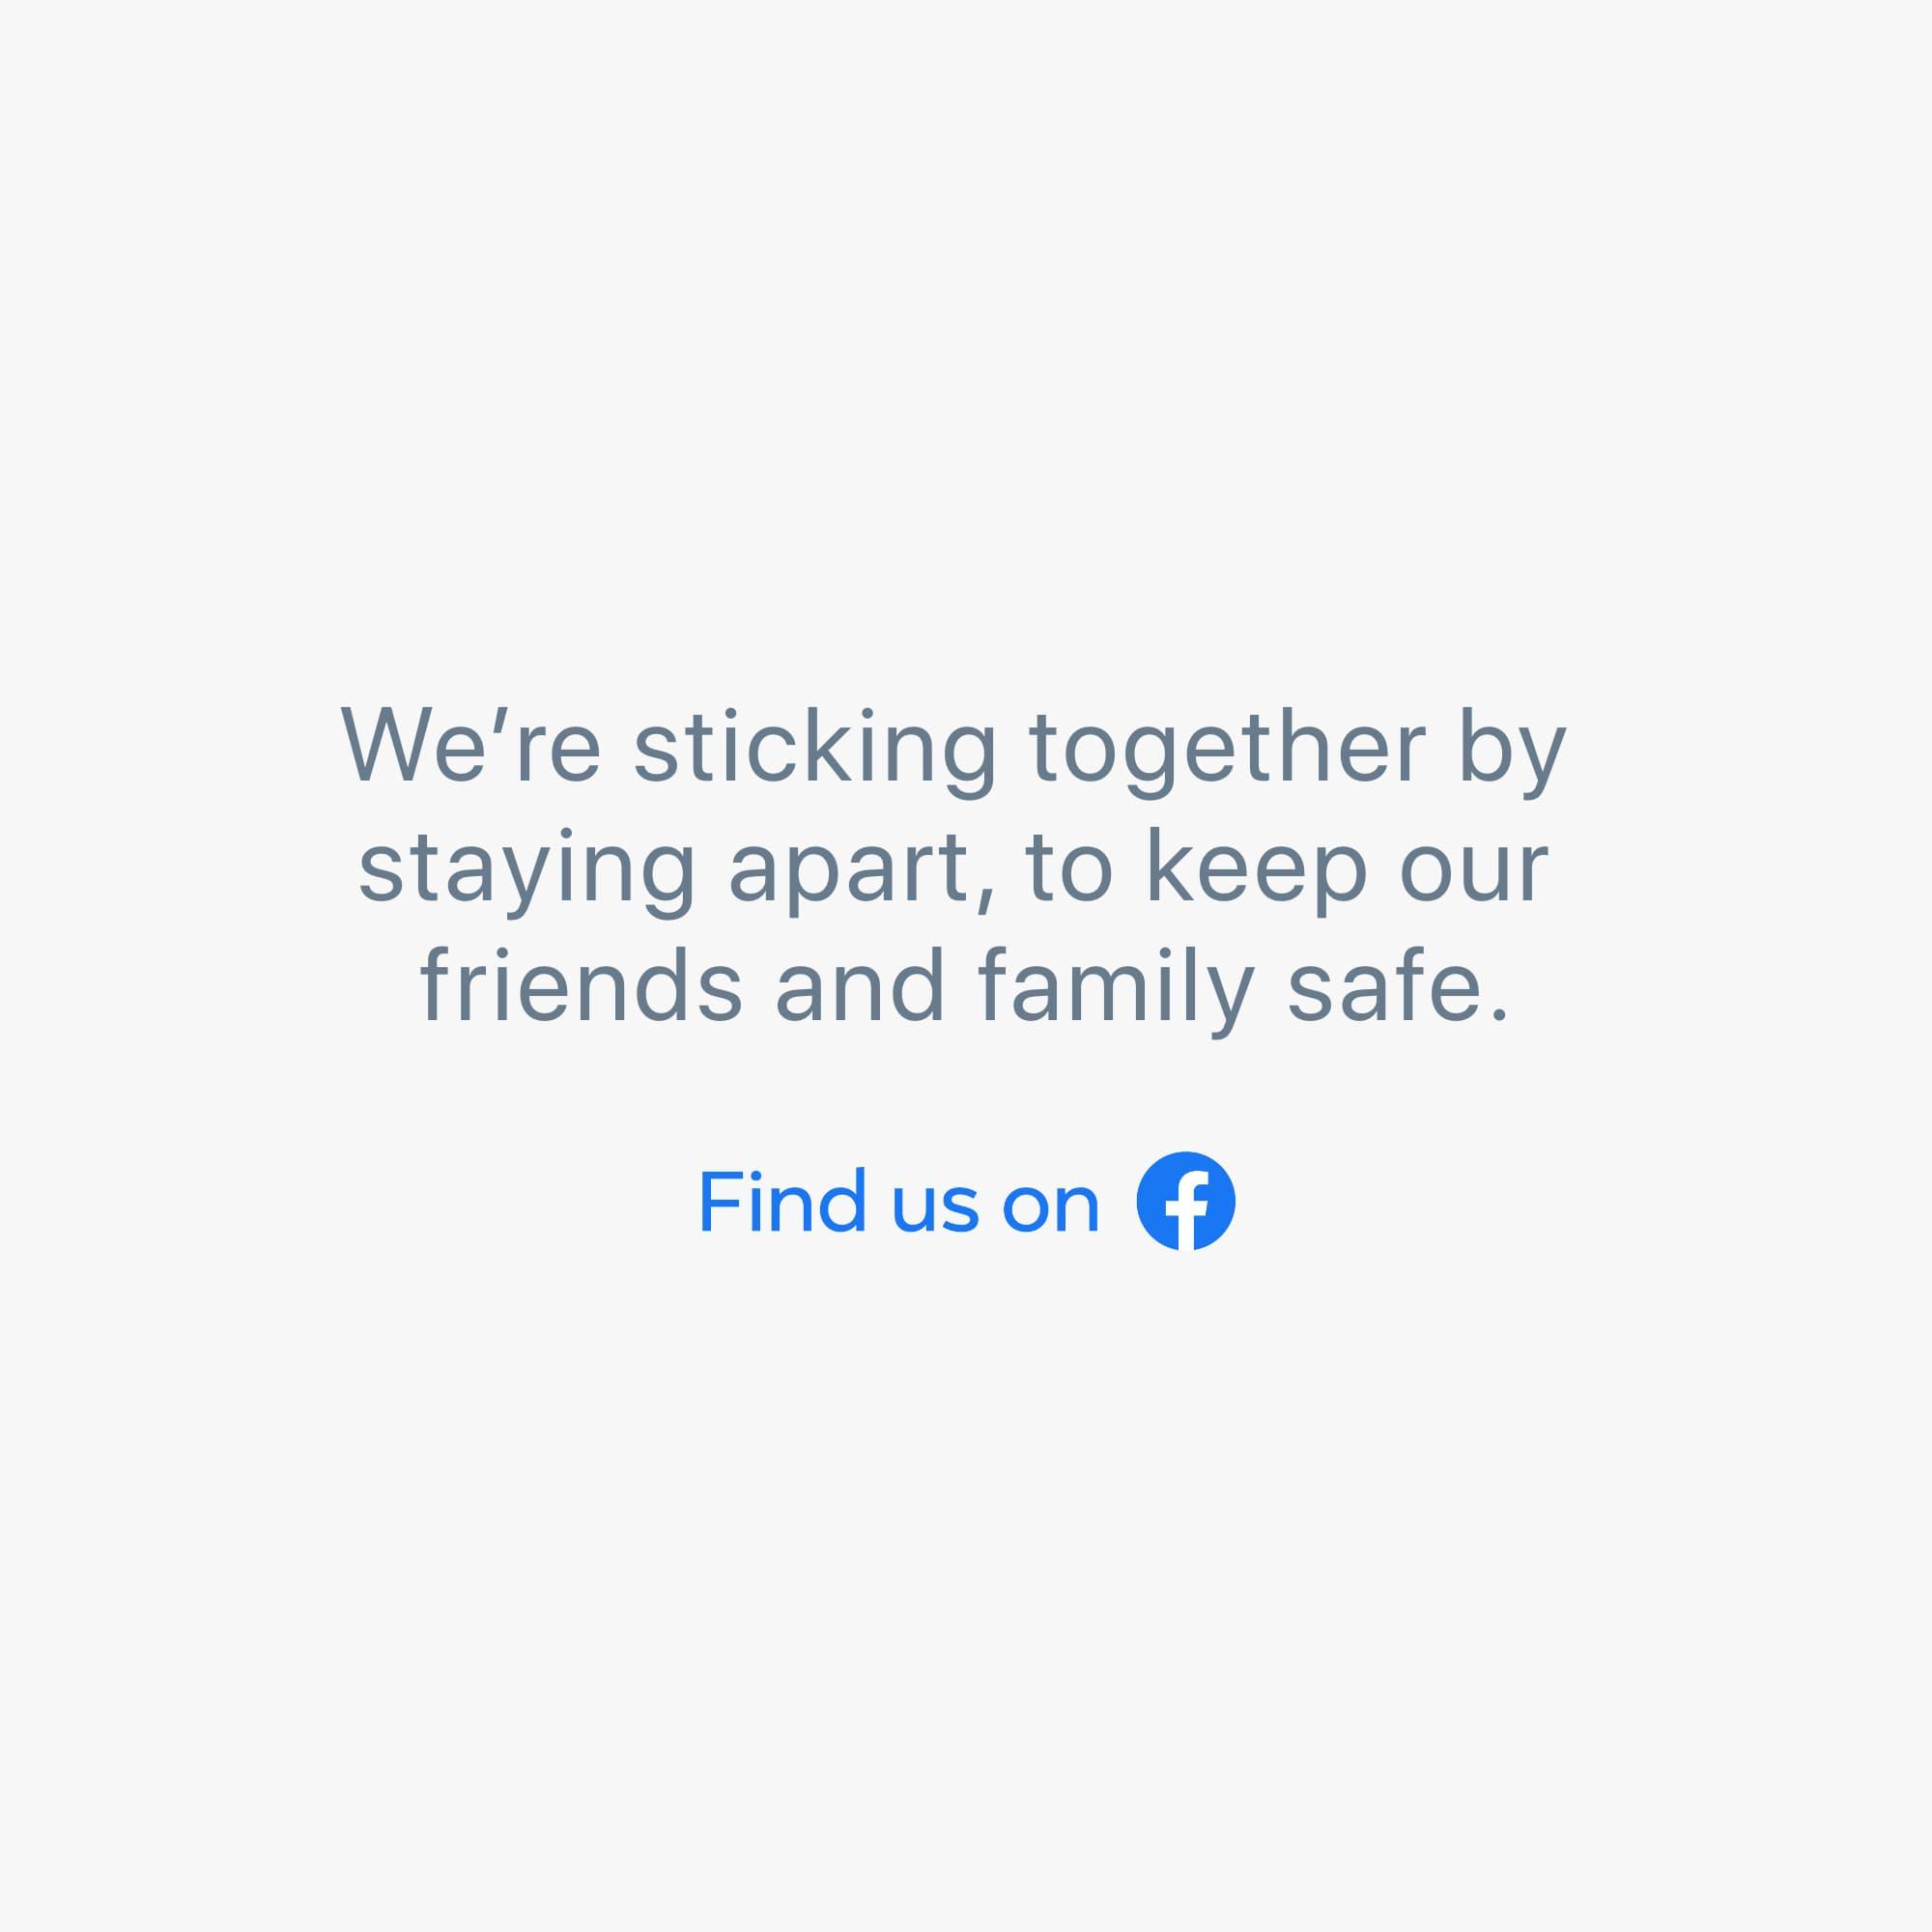 amy-jones-facebook-spacebook-social-distancing-8@2x